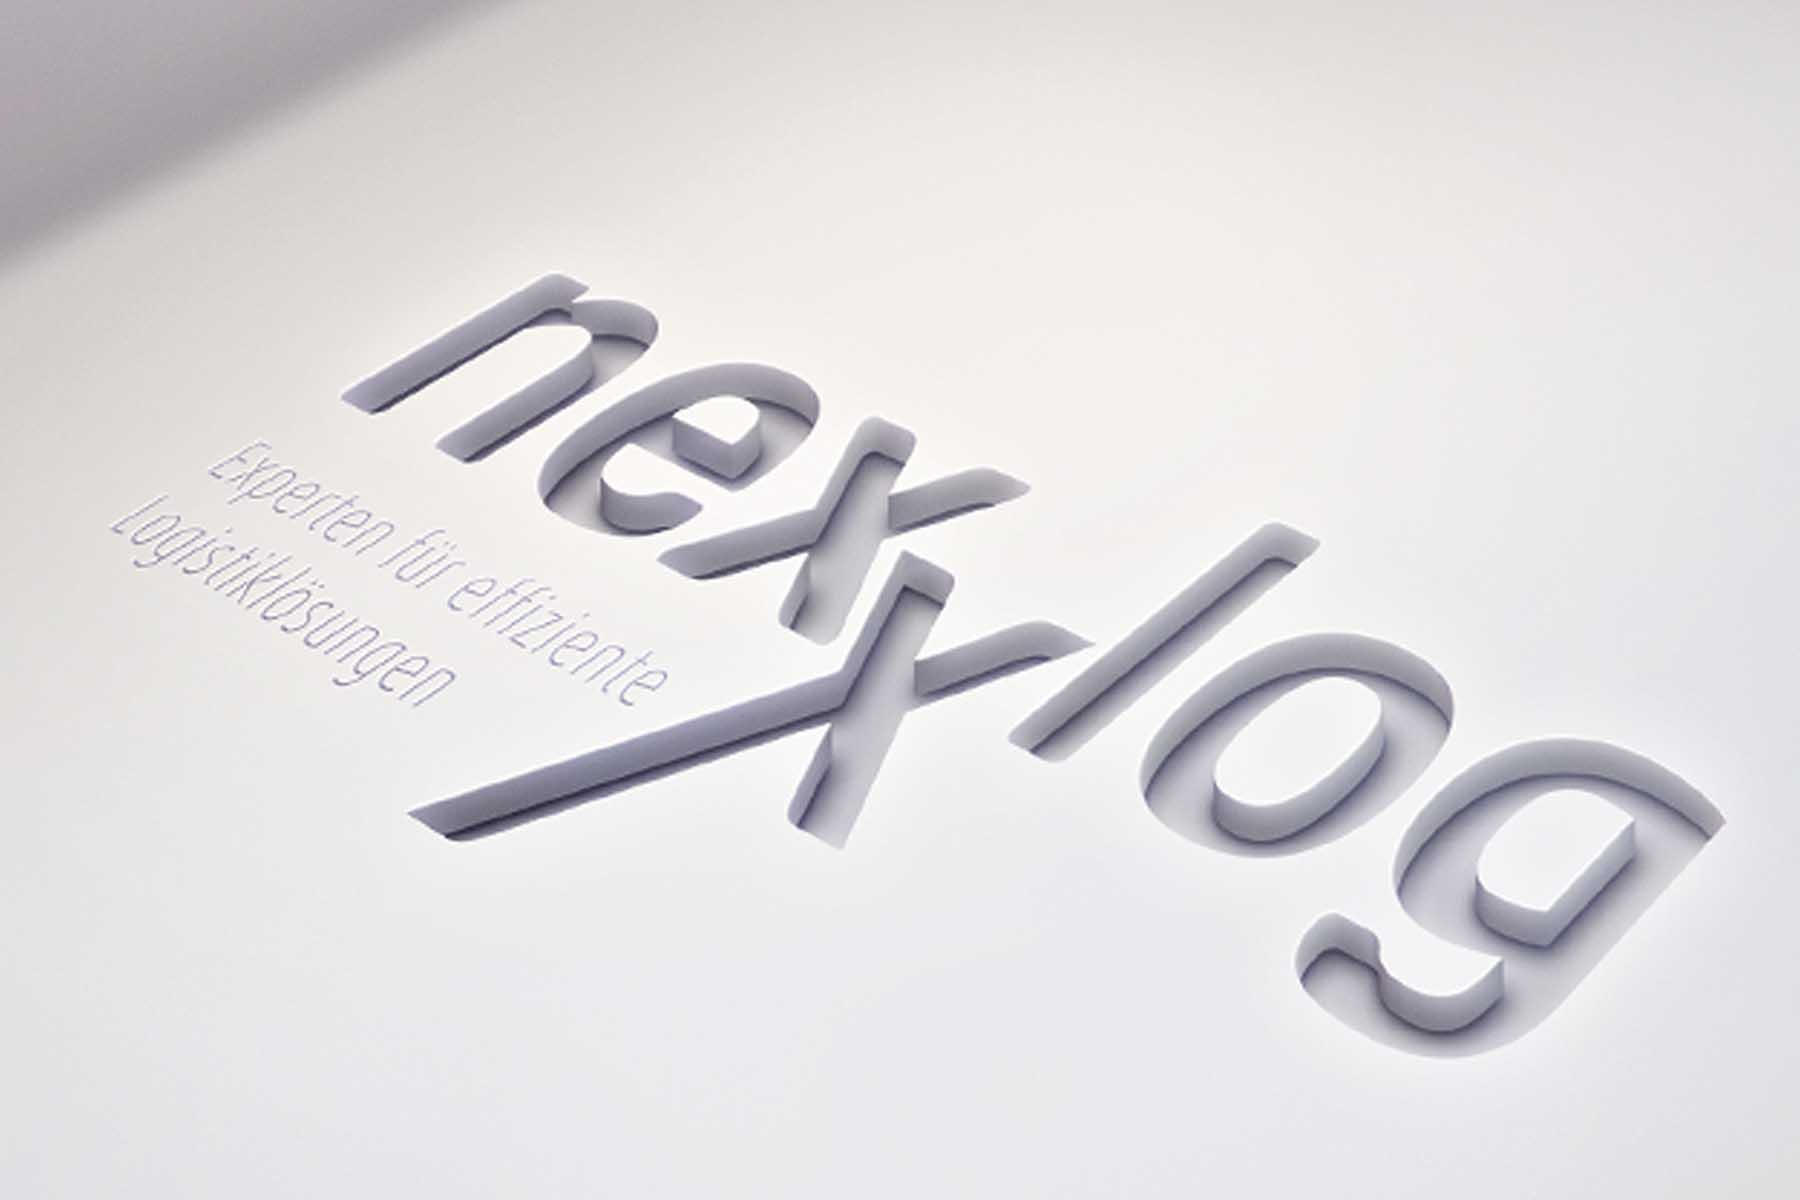 eh_referenzen_nexxlog_1 Projekt - Nexxlog